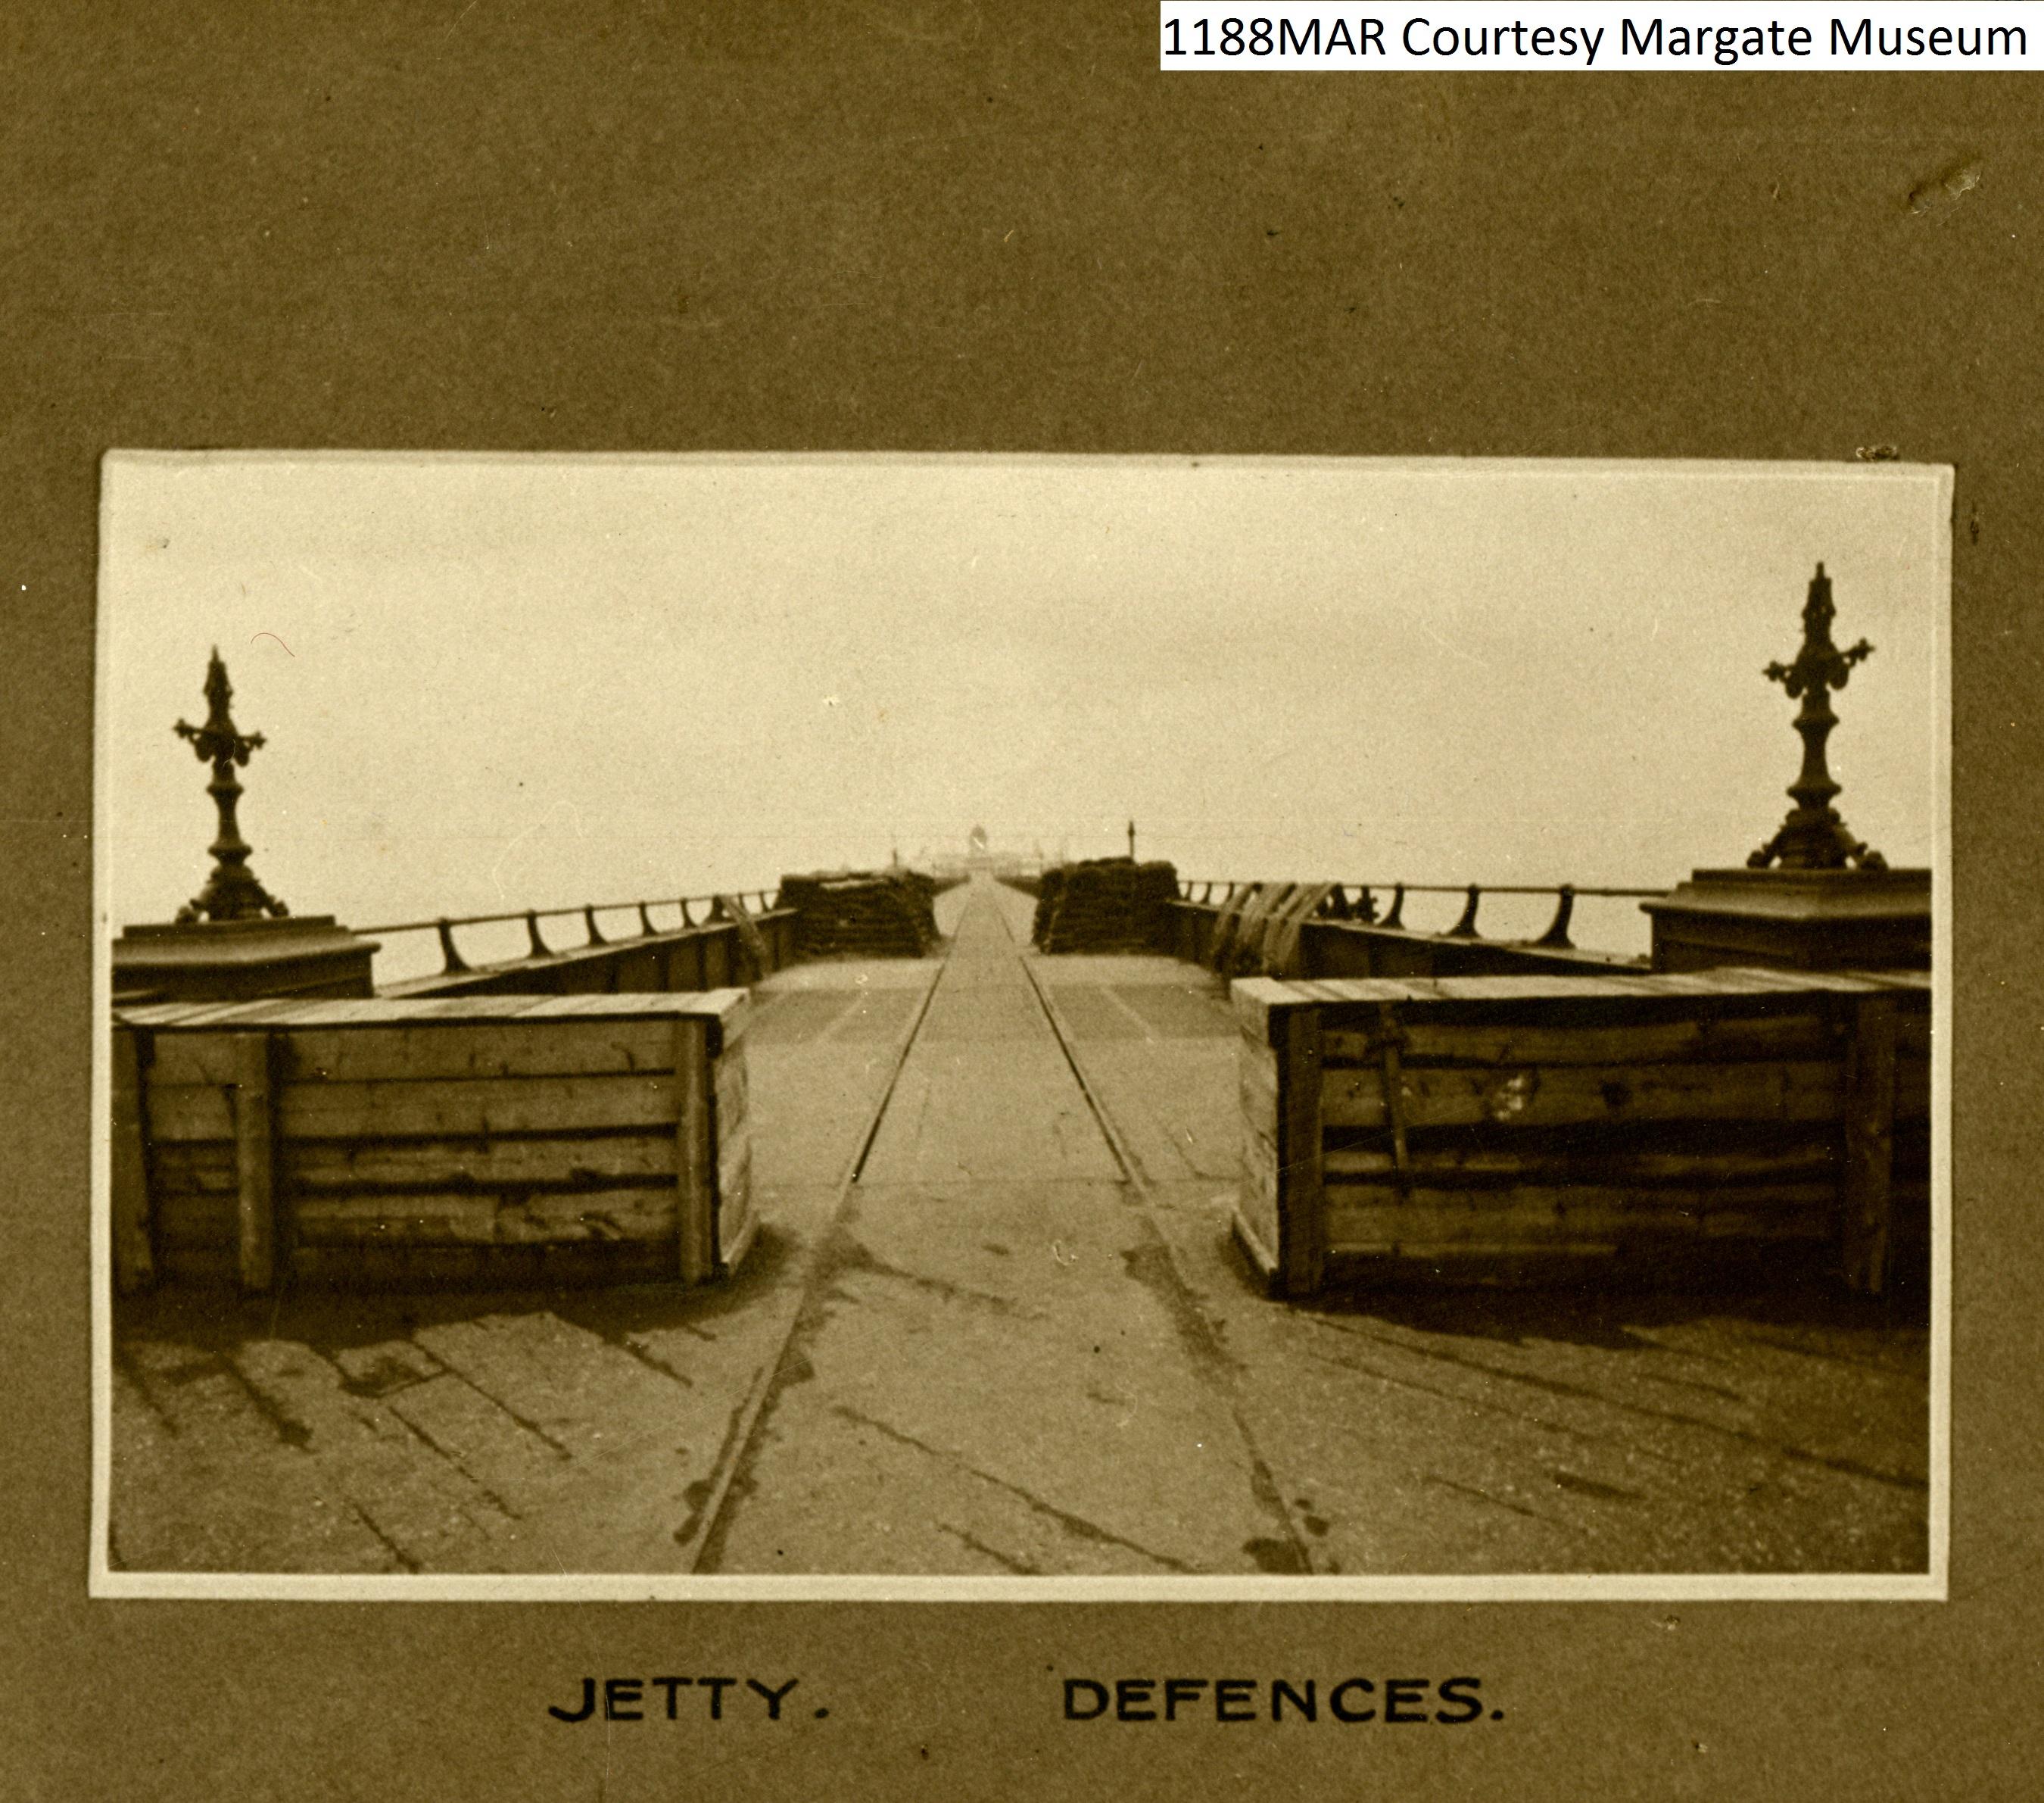 Jetty Defences